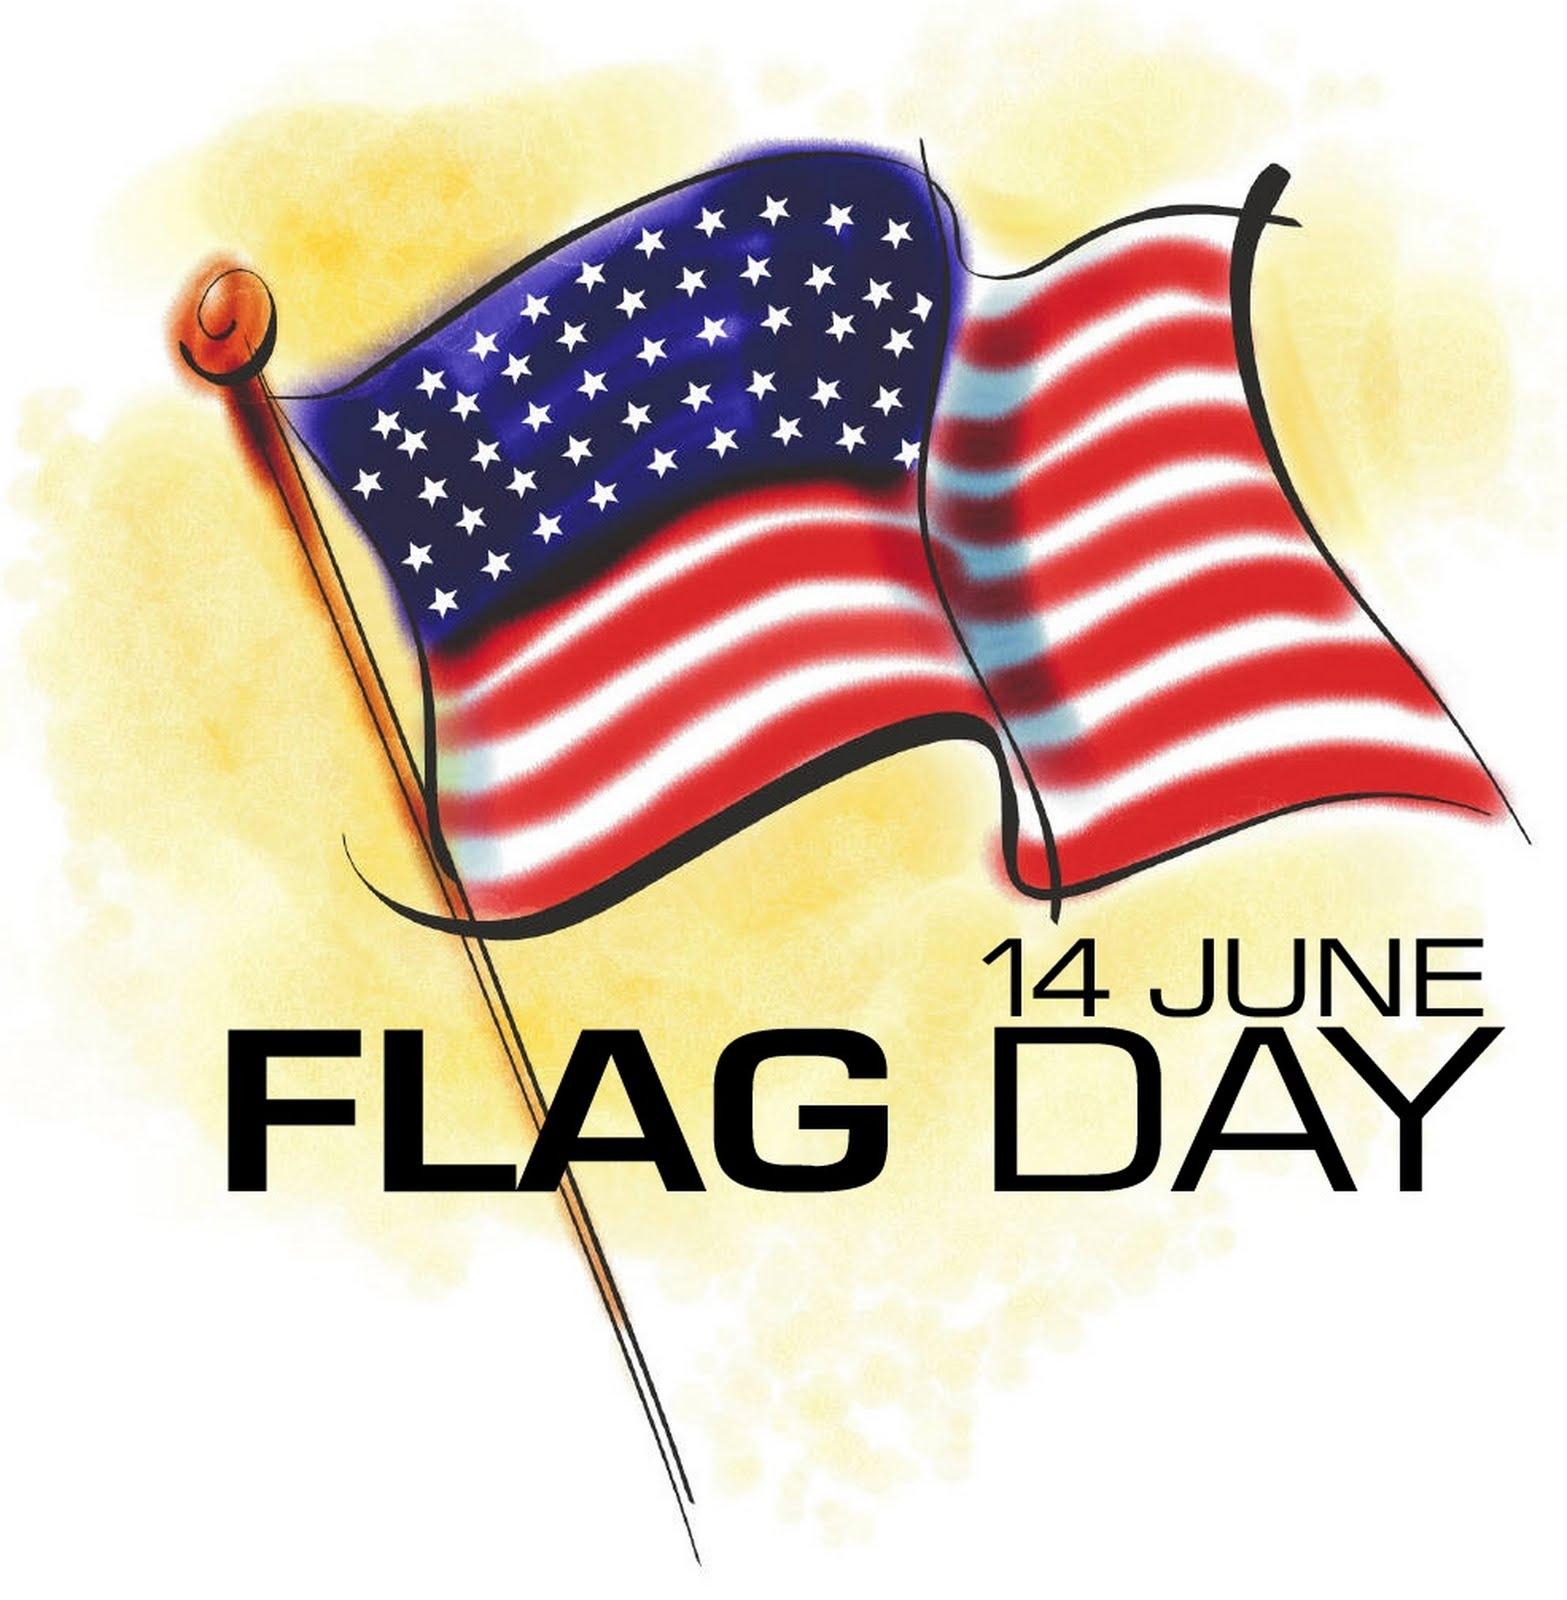 Happy Flag Day!!!